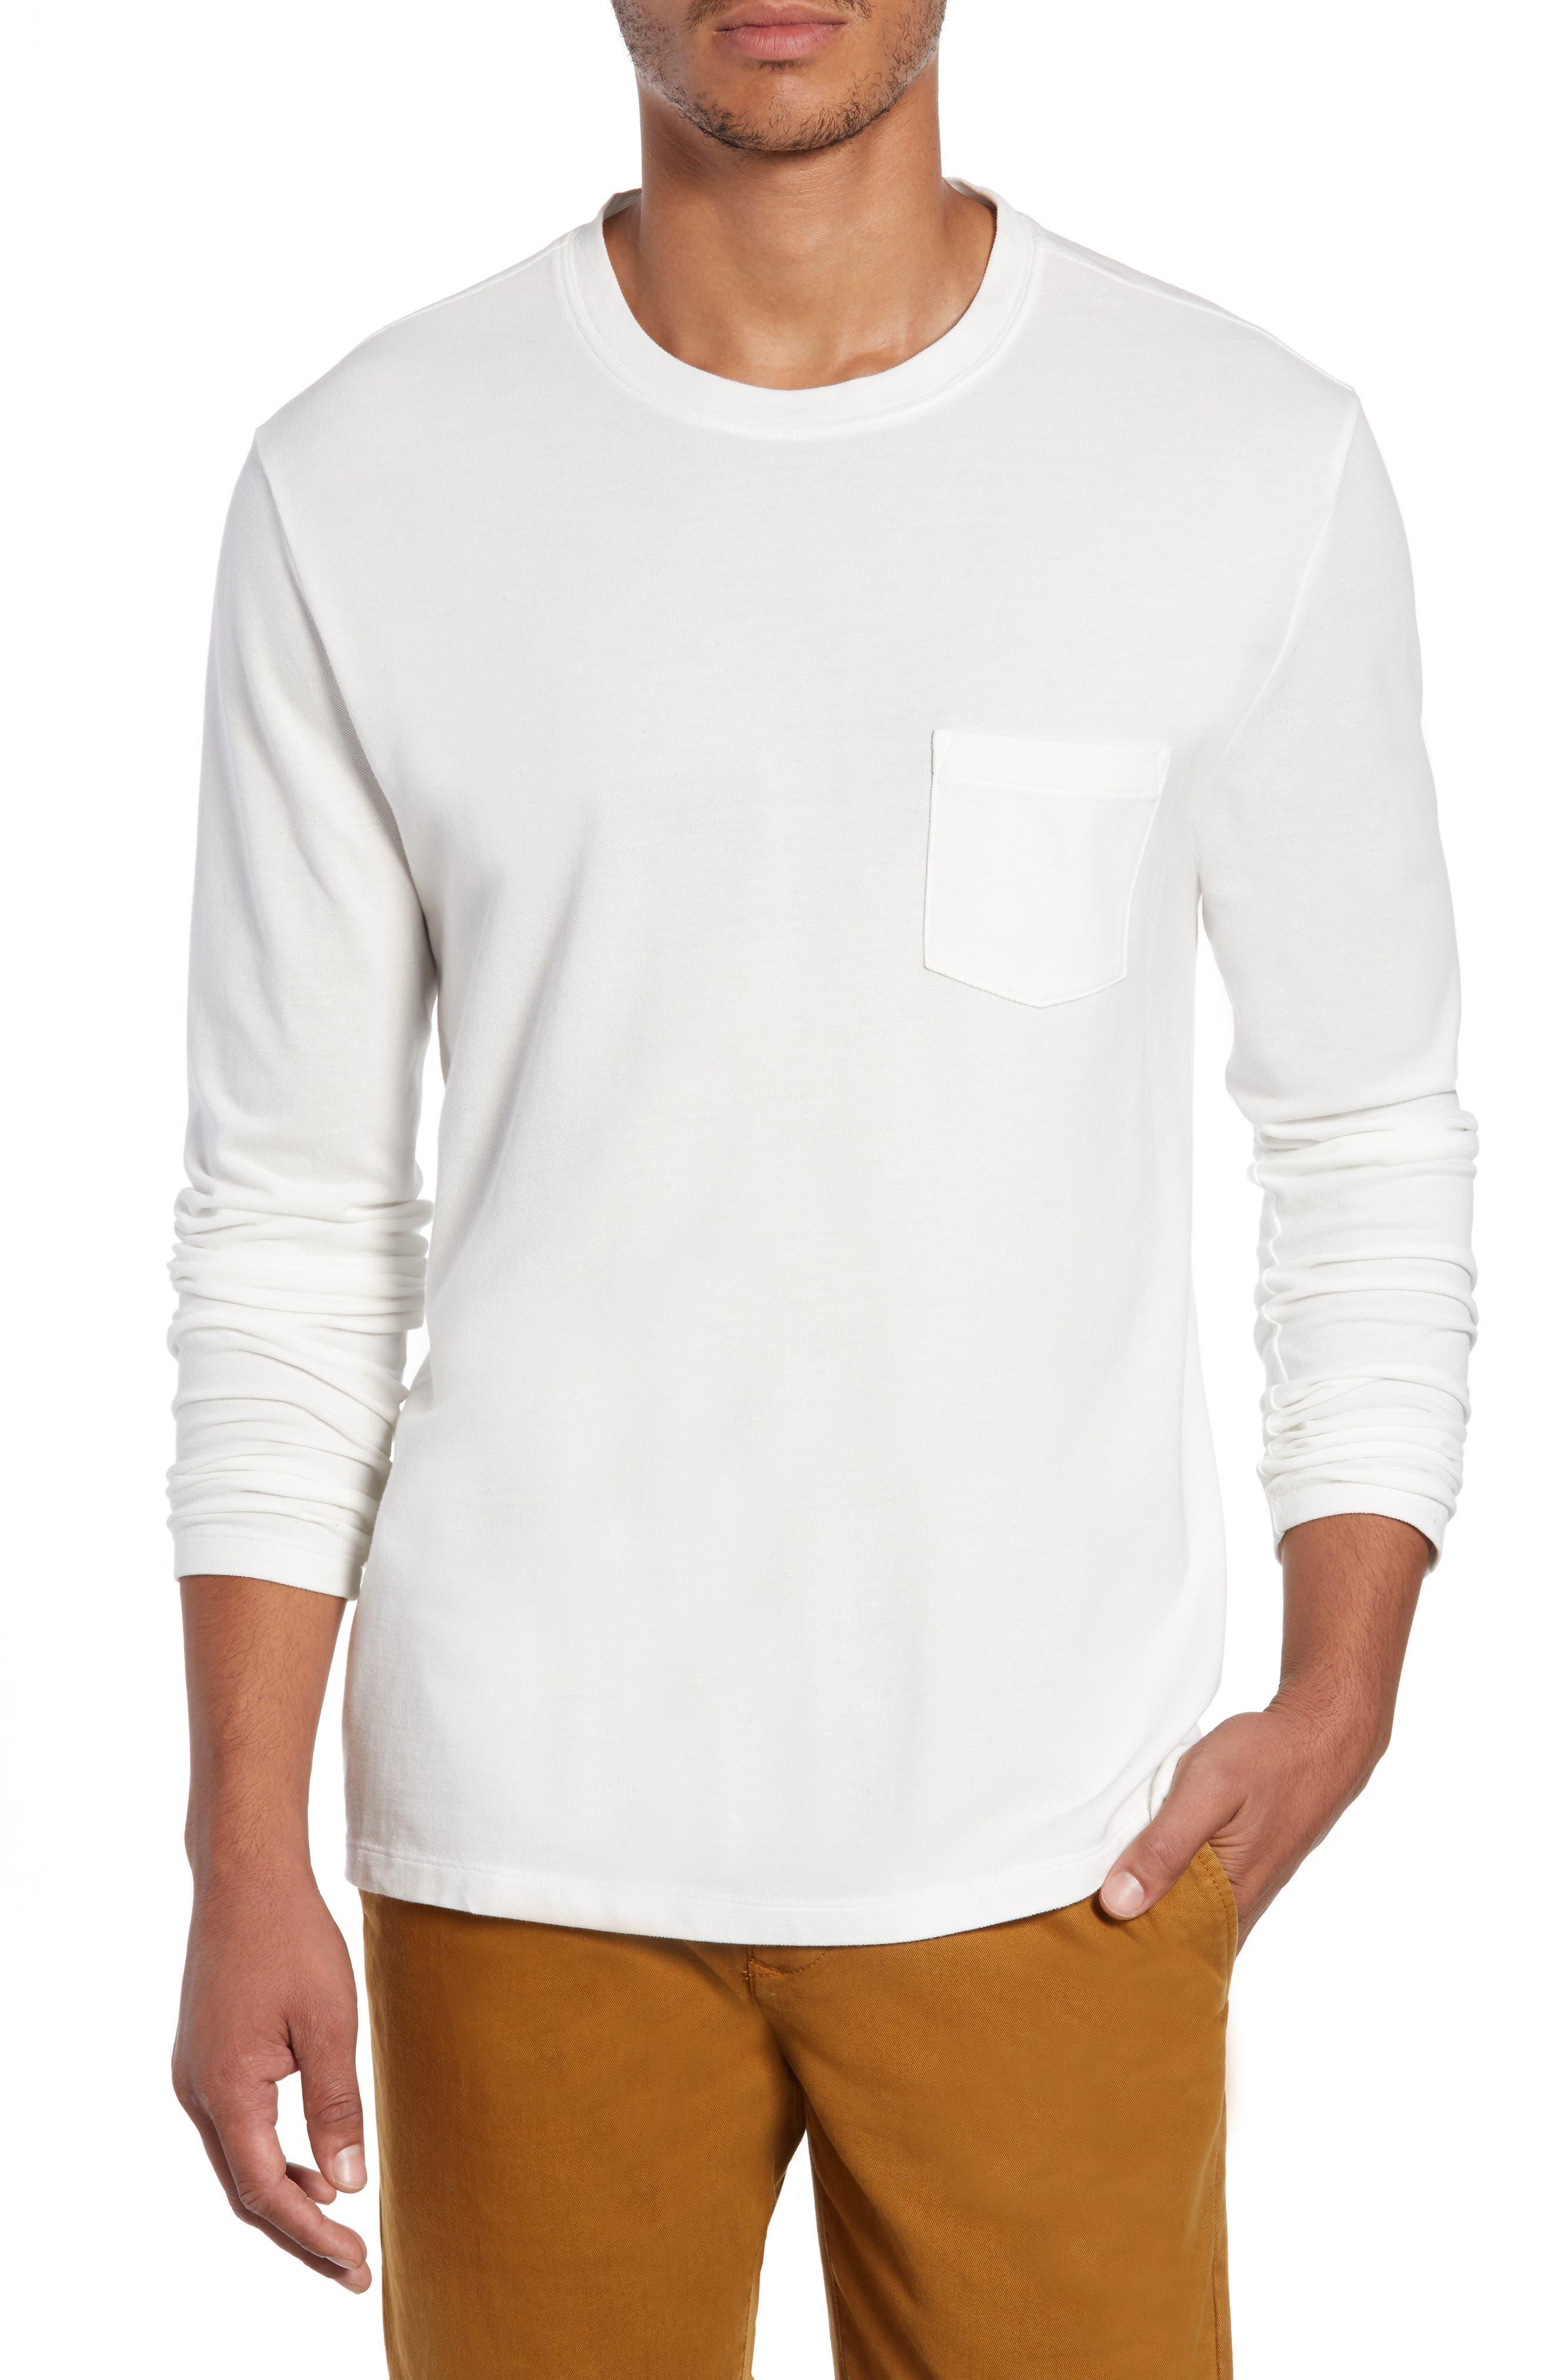 Piqua Pocket T-Shirt,                         Main,                         color, WHITE